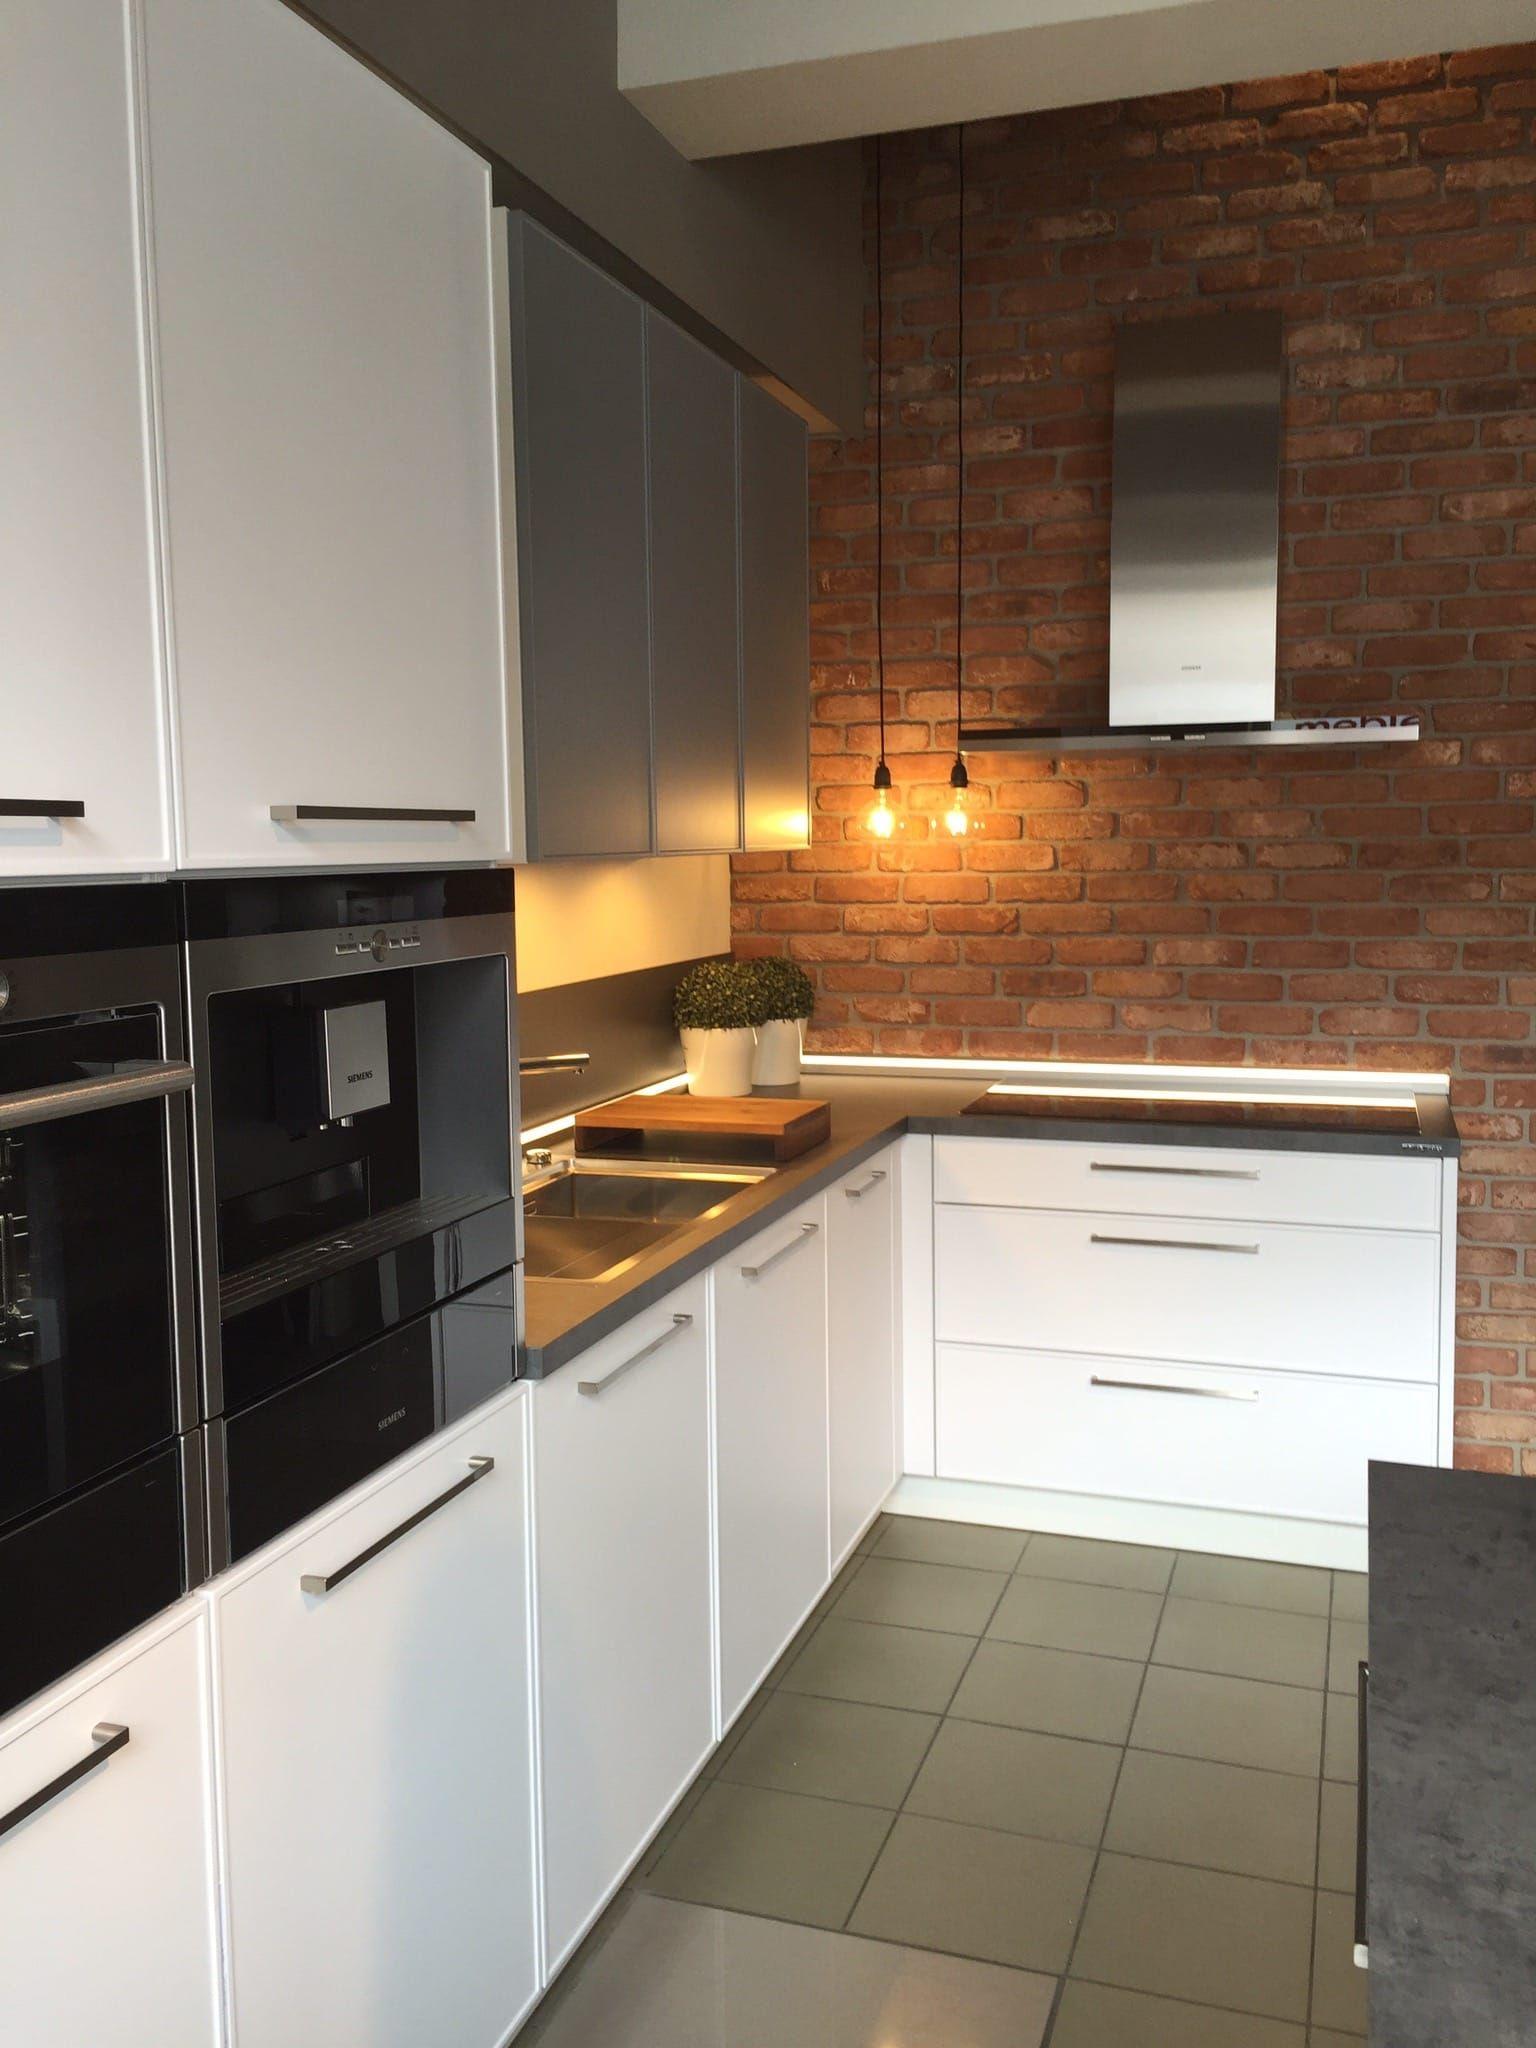 Beautiful Modern Kitchen With A Wall Of Bricks Kuchnia Ze Sciana Z Cegly Modern Kitchen Kitchen Kitchen Cabinets